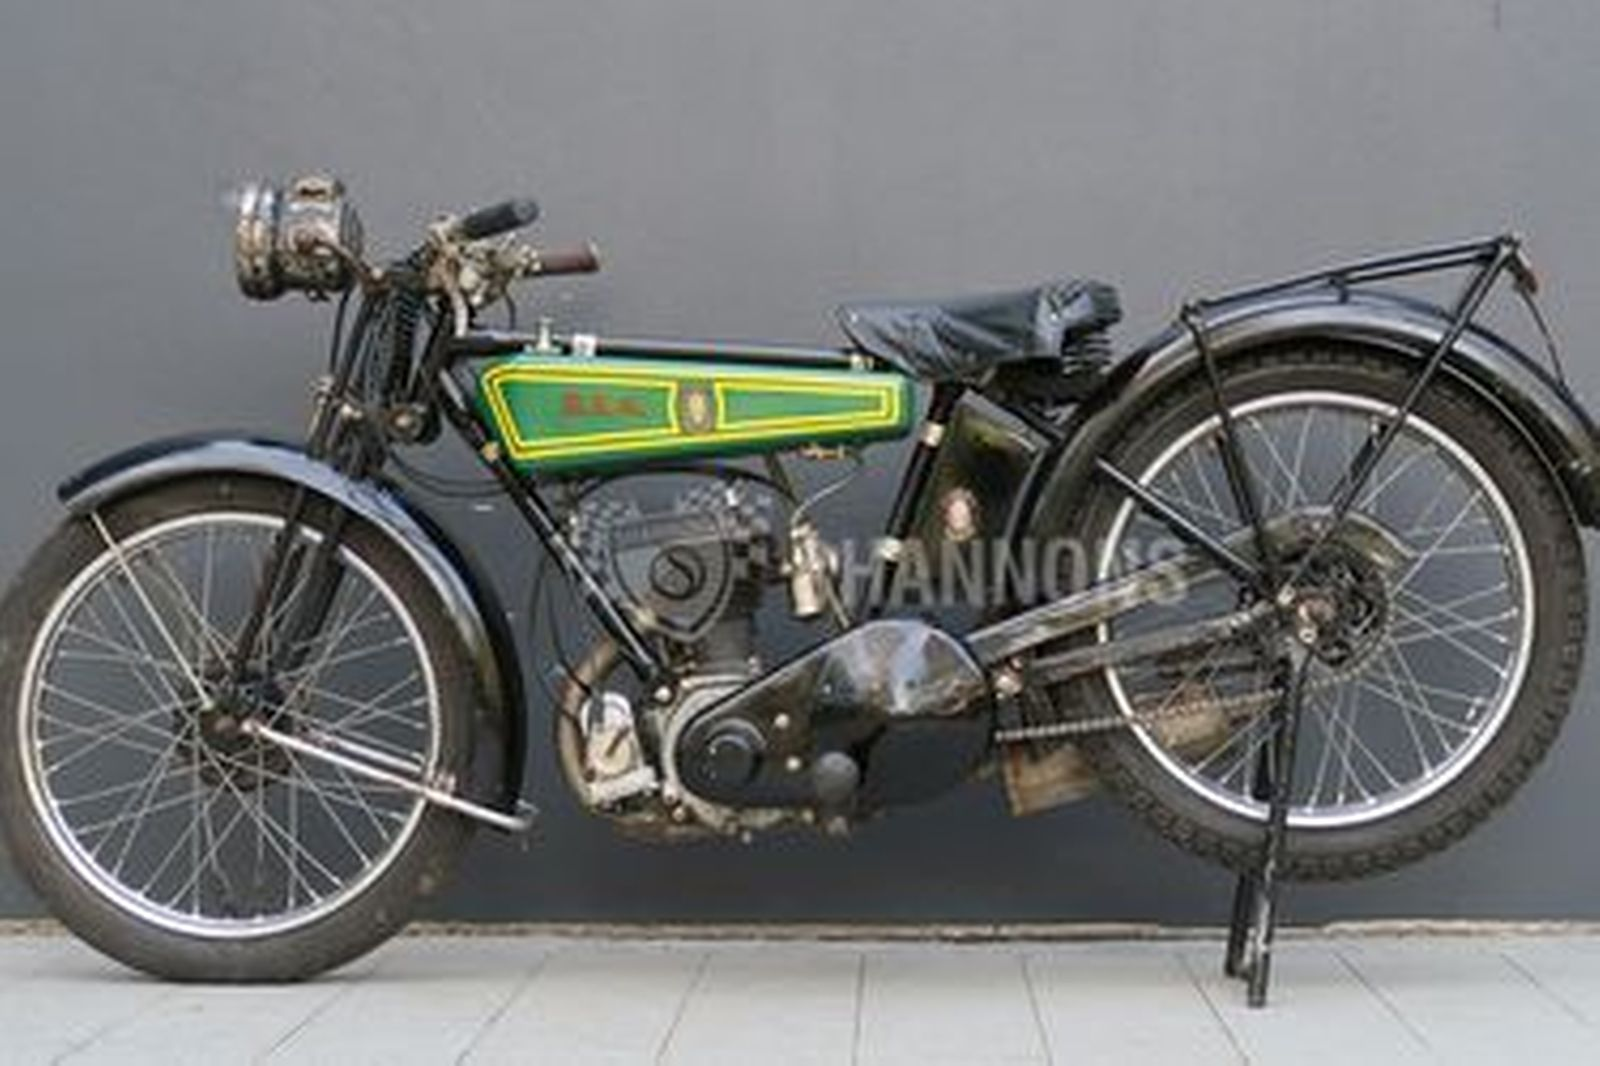 BSA DeLuxe 2.49HP 250cc Motorcycle